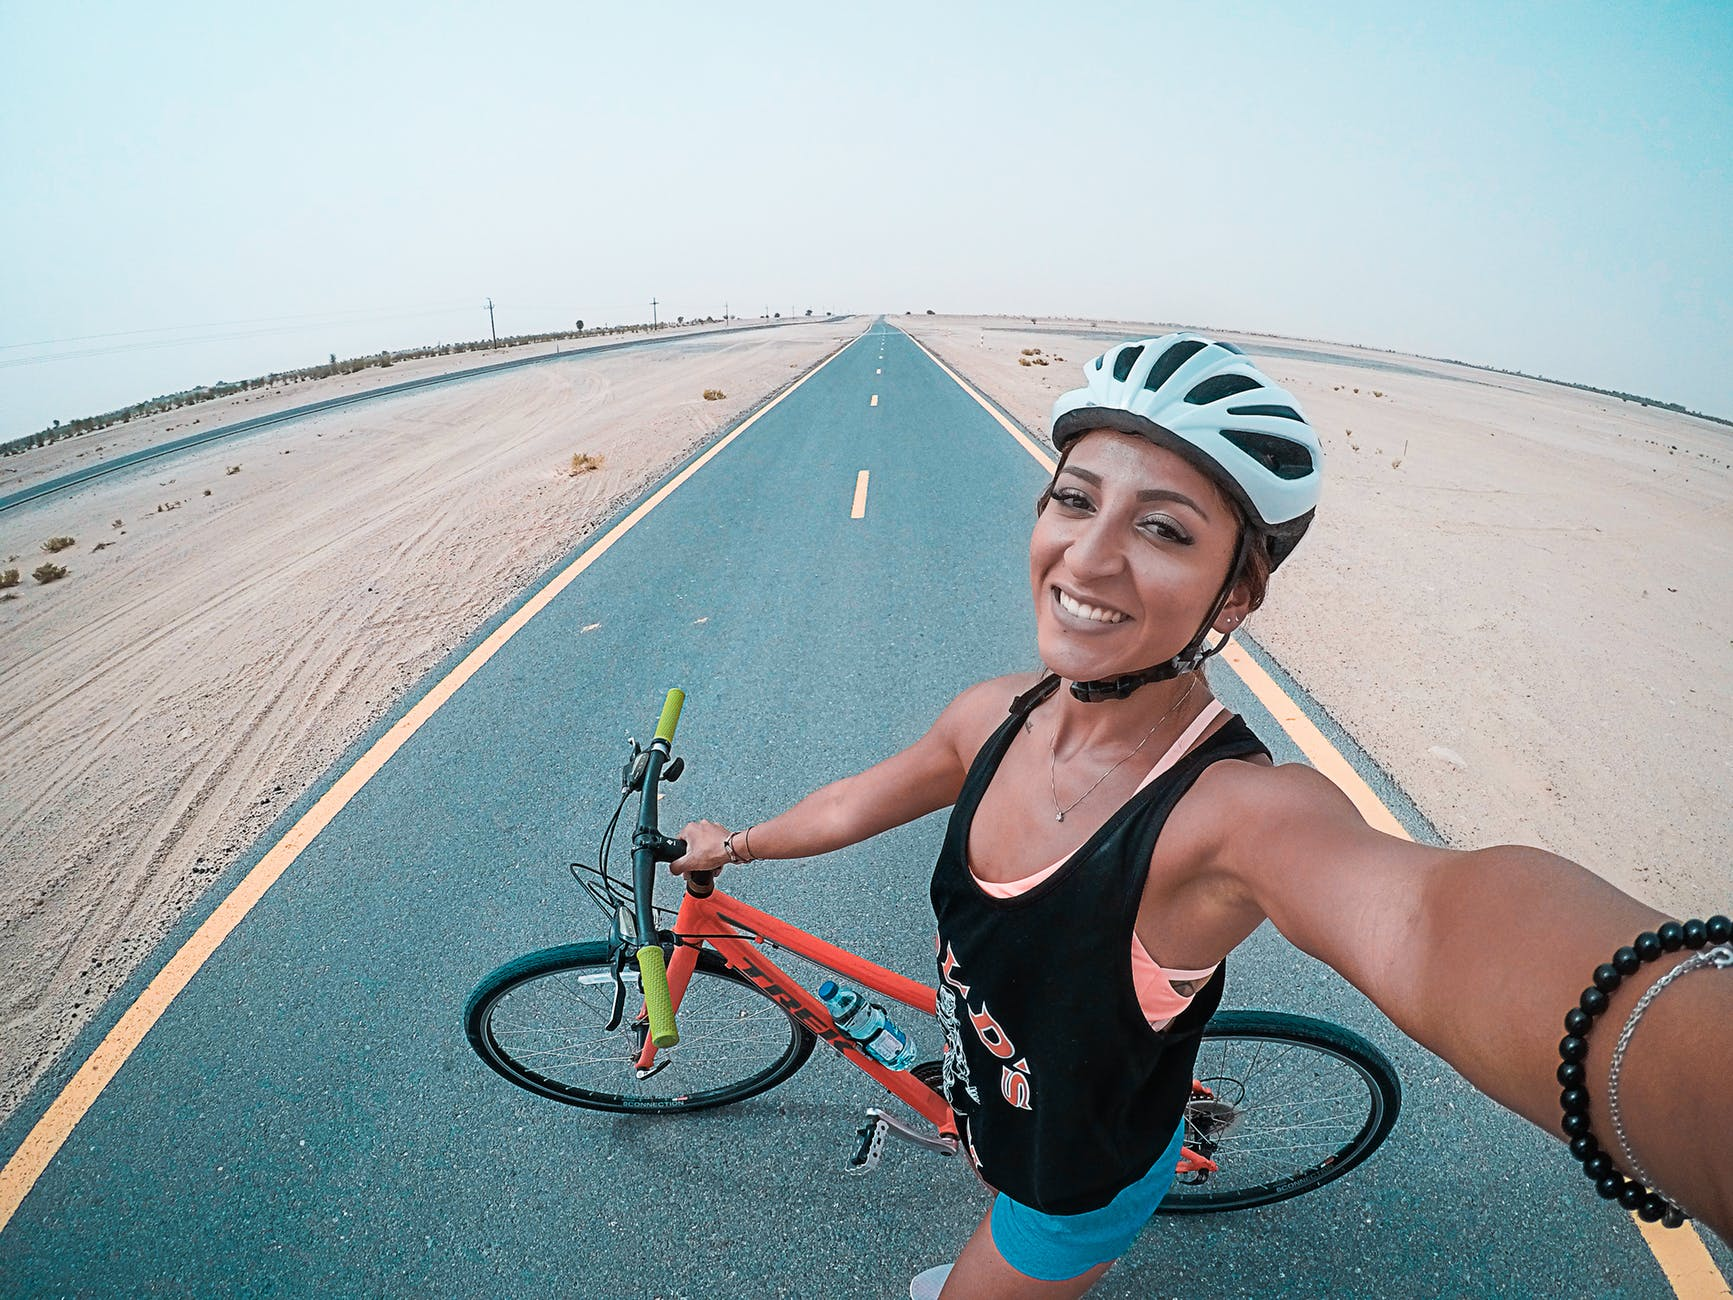 woman holding bicycle on asphalt road